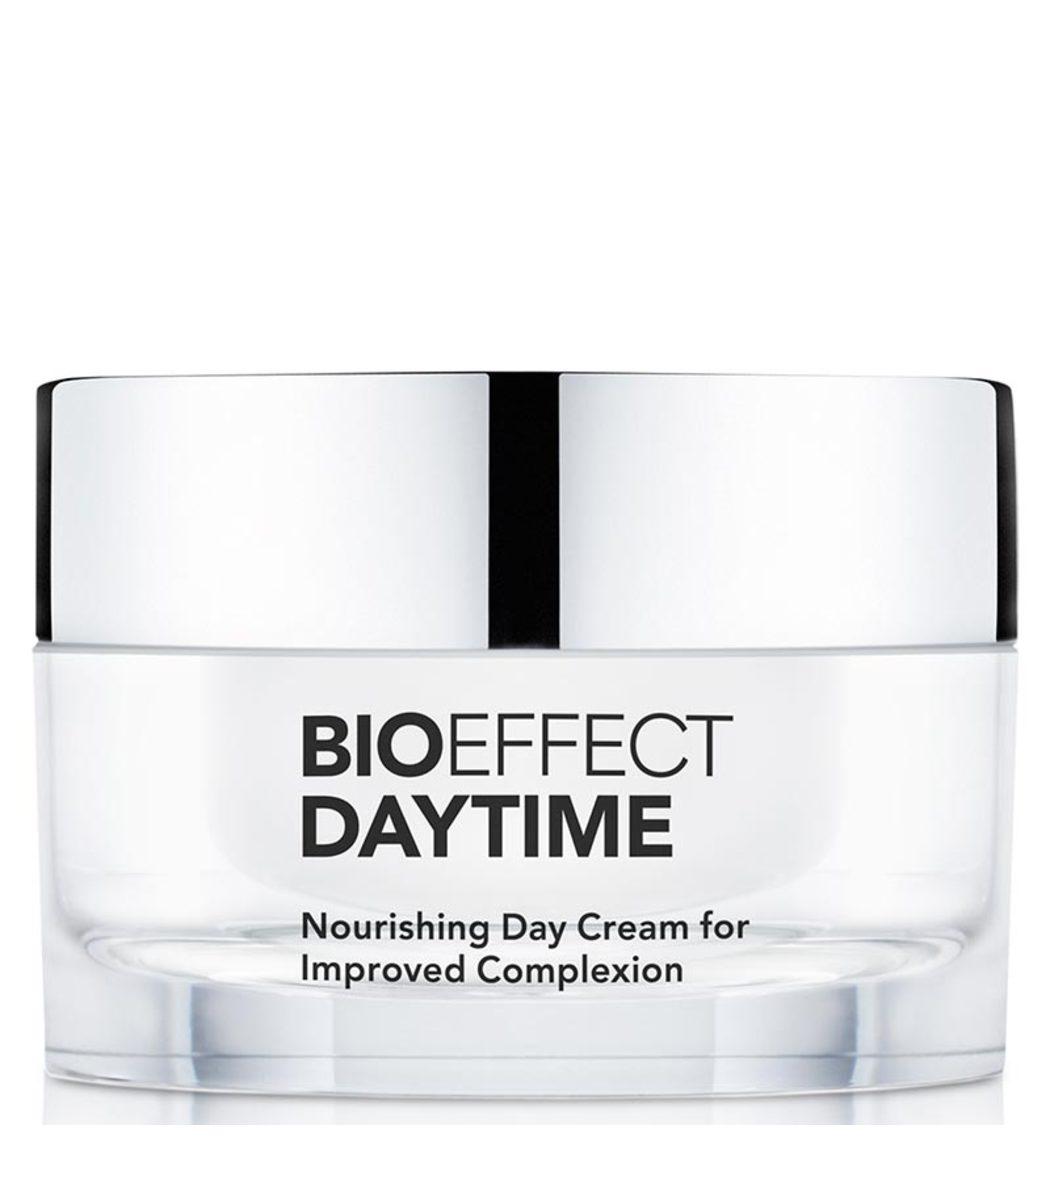 BIOEFFECT Daytime Moisurizing Cream